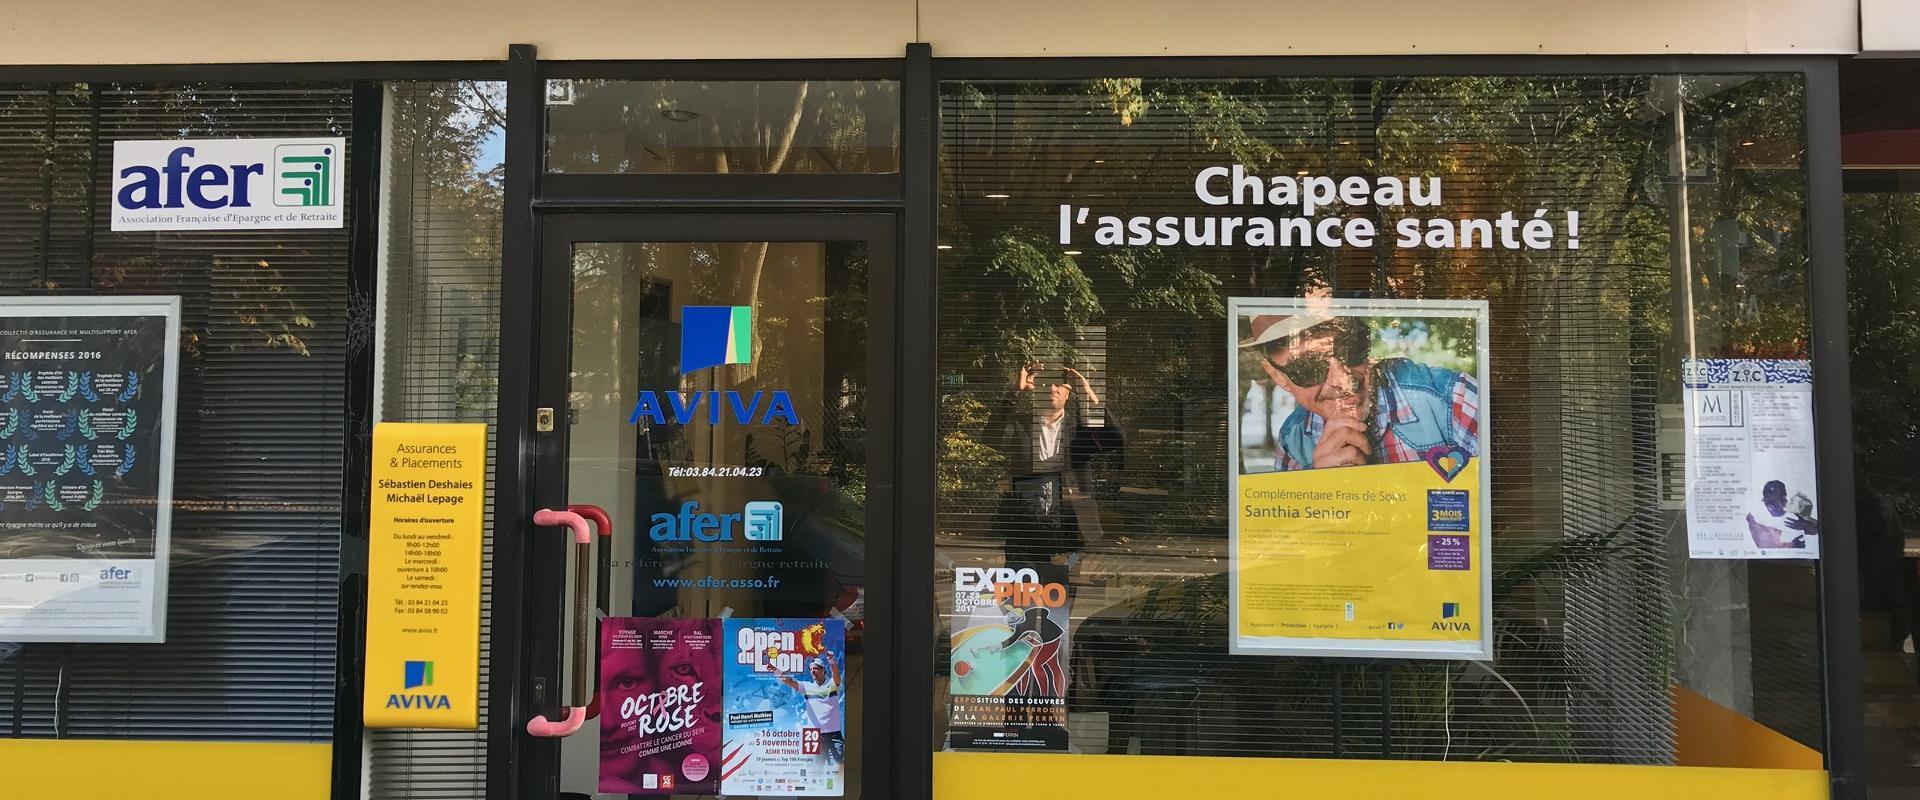 agence assurance DESHAIES-LEPAGE